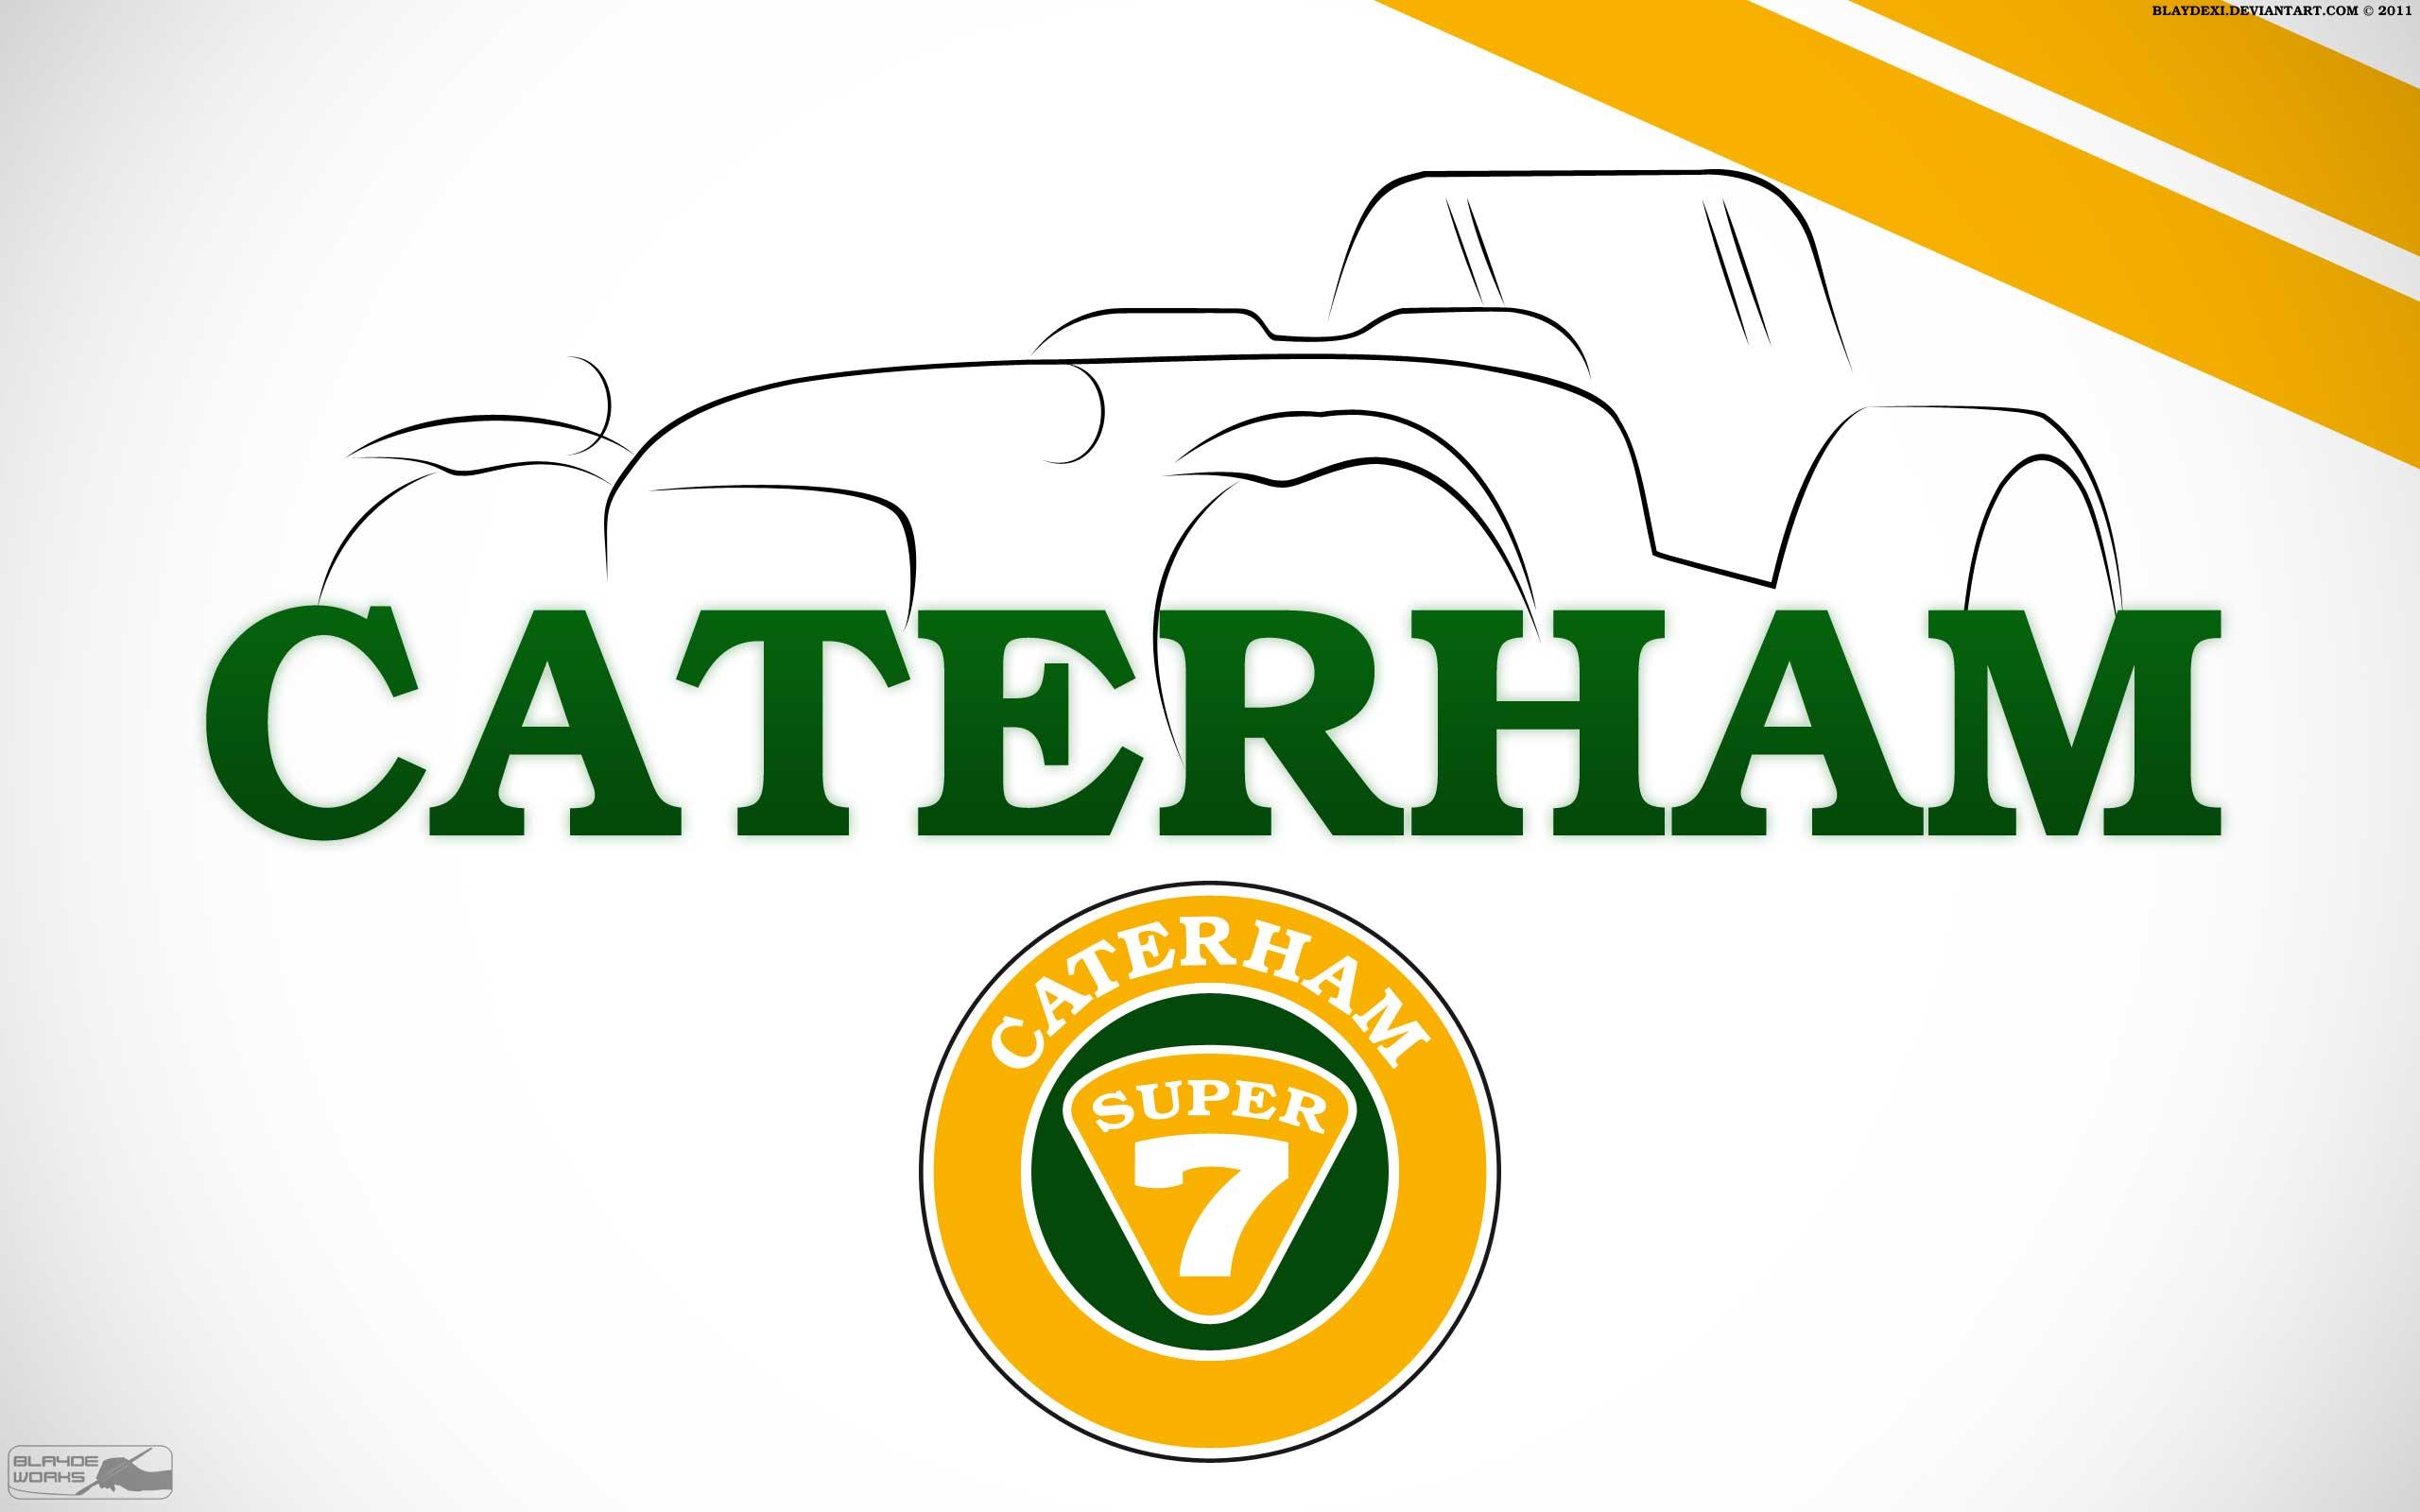 Caterham logo wallpapers HD